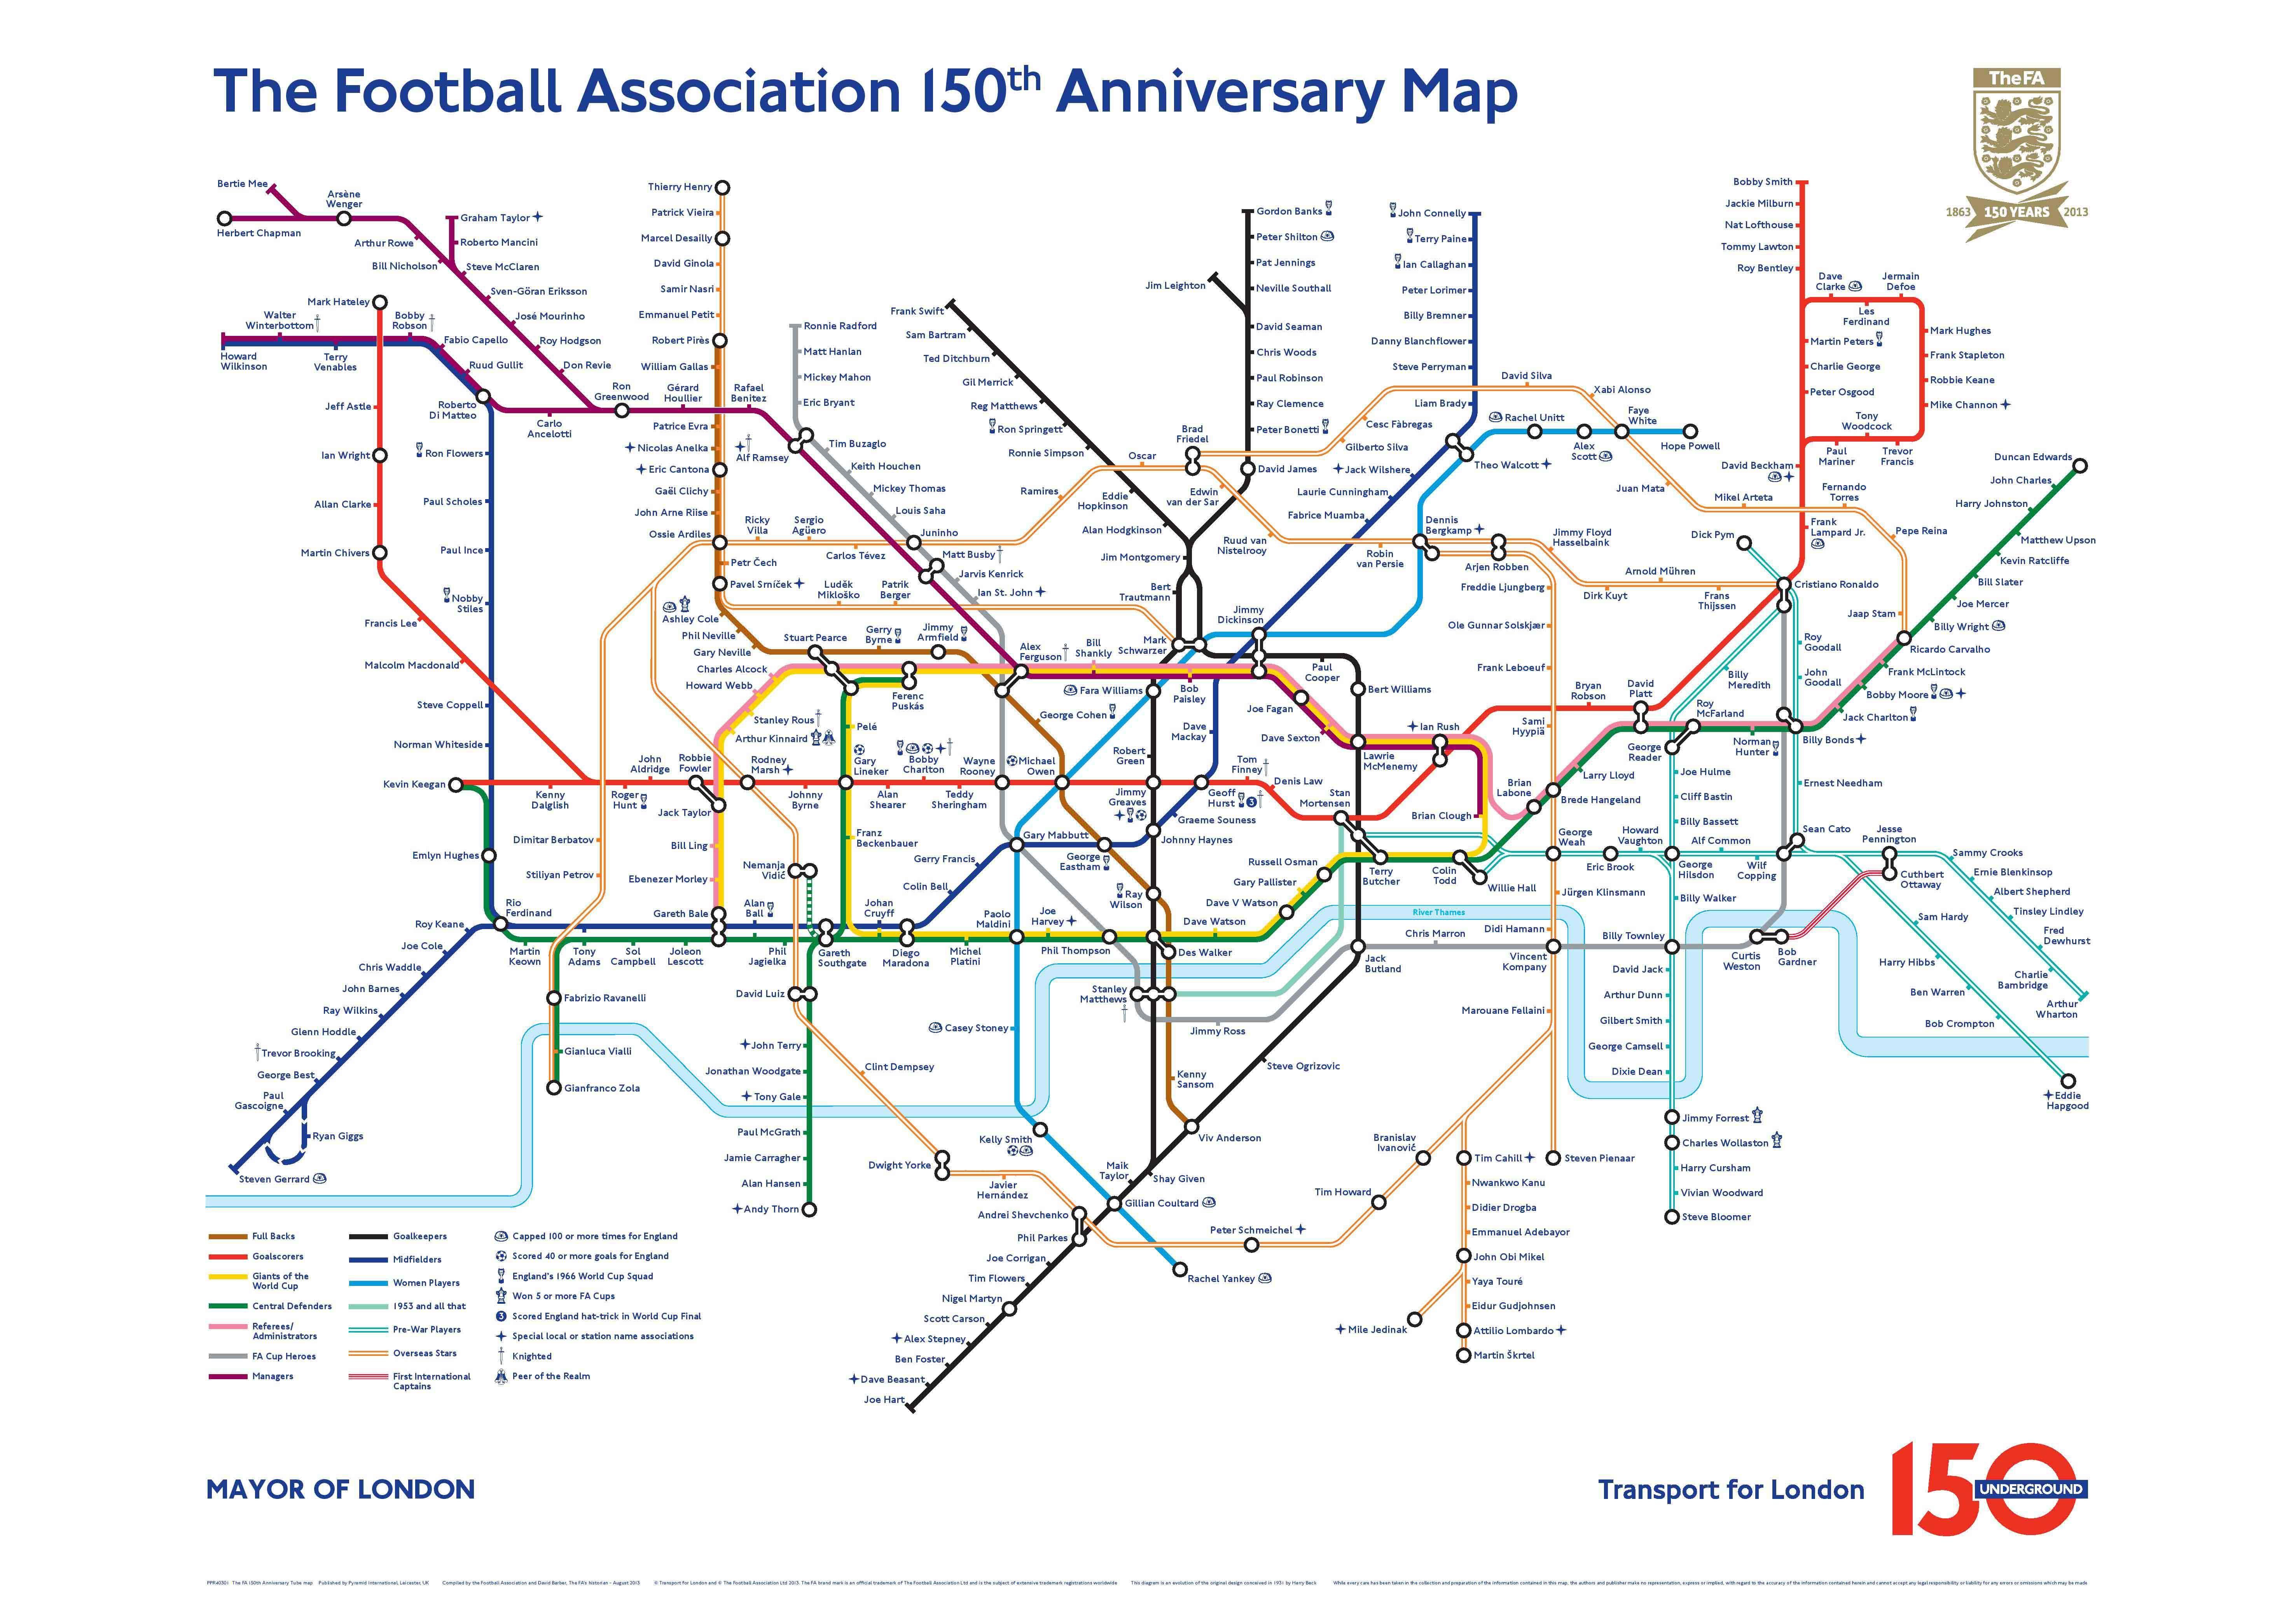 London Tube Map The Football Association 150th